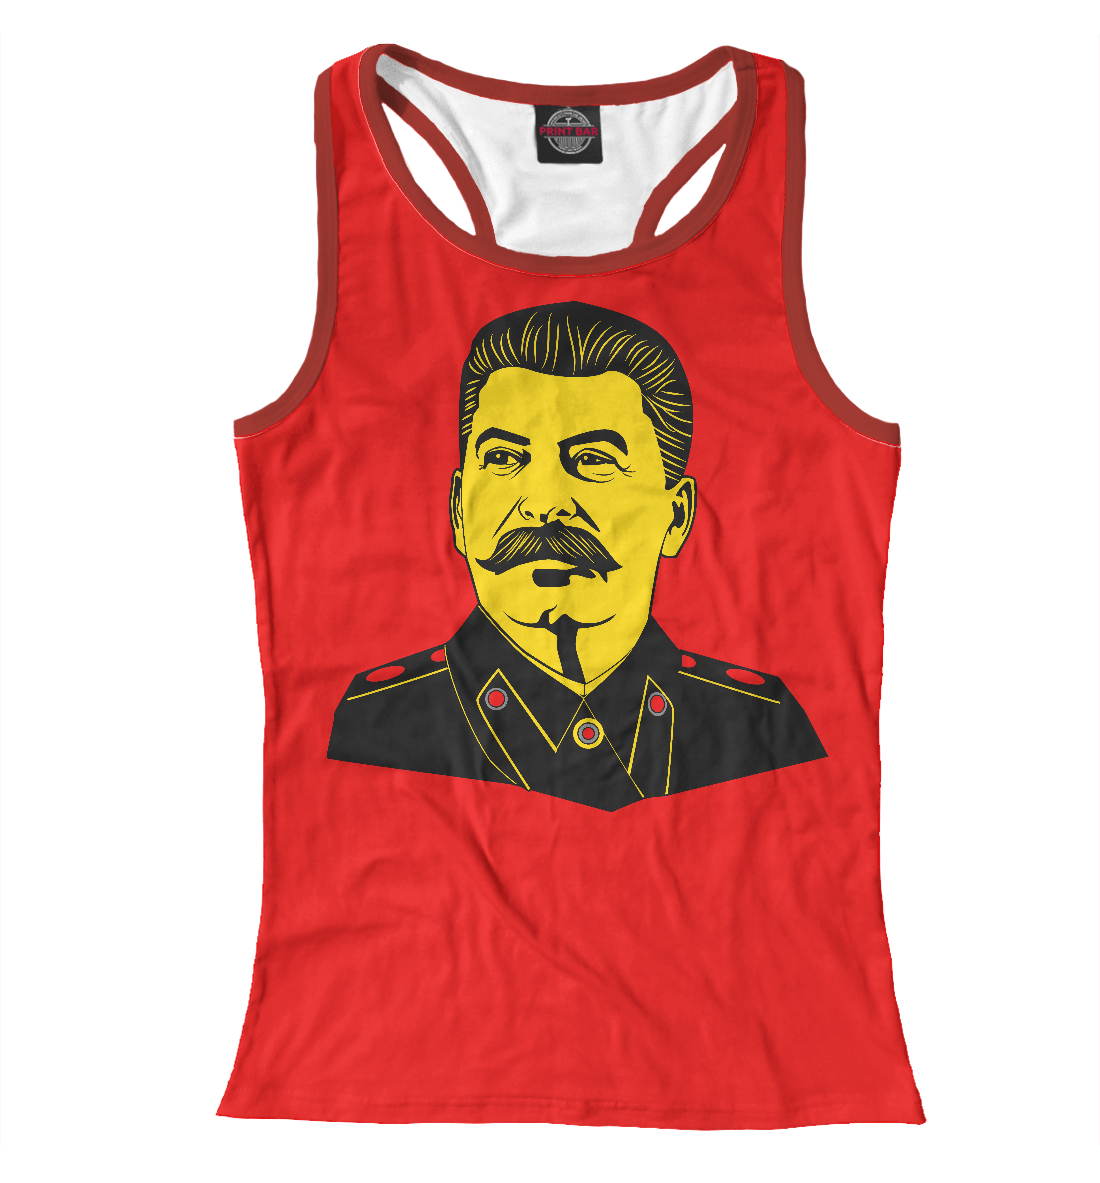 Купить Дизайн советский, Printbar, Майки борцовки, SSS-528301-mayb-1